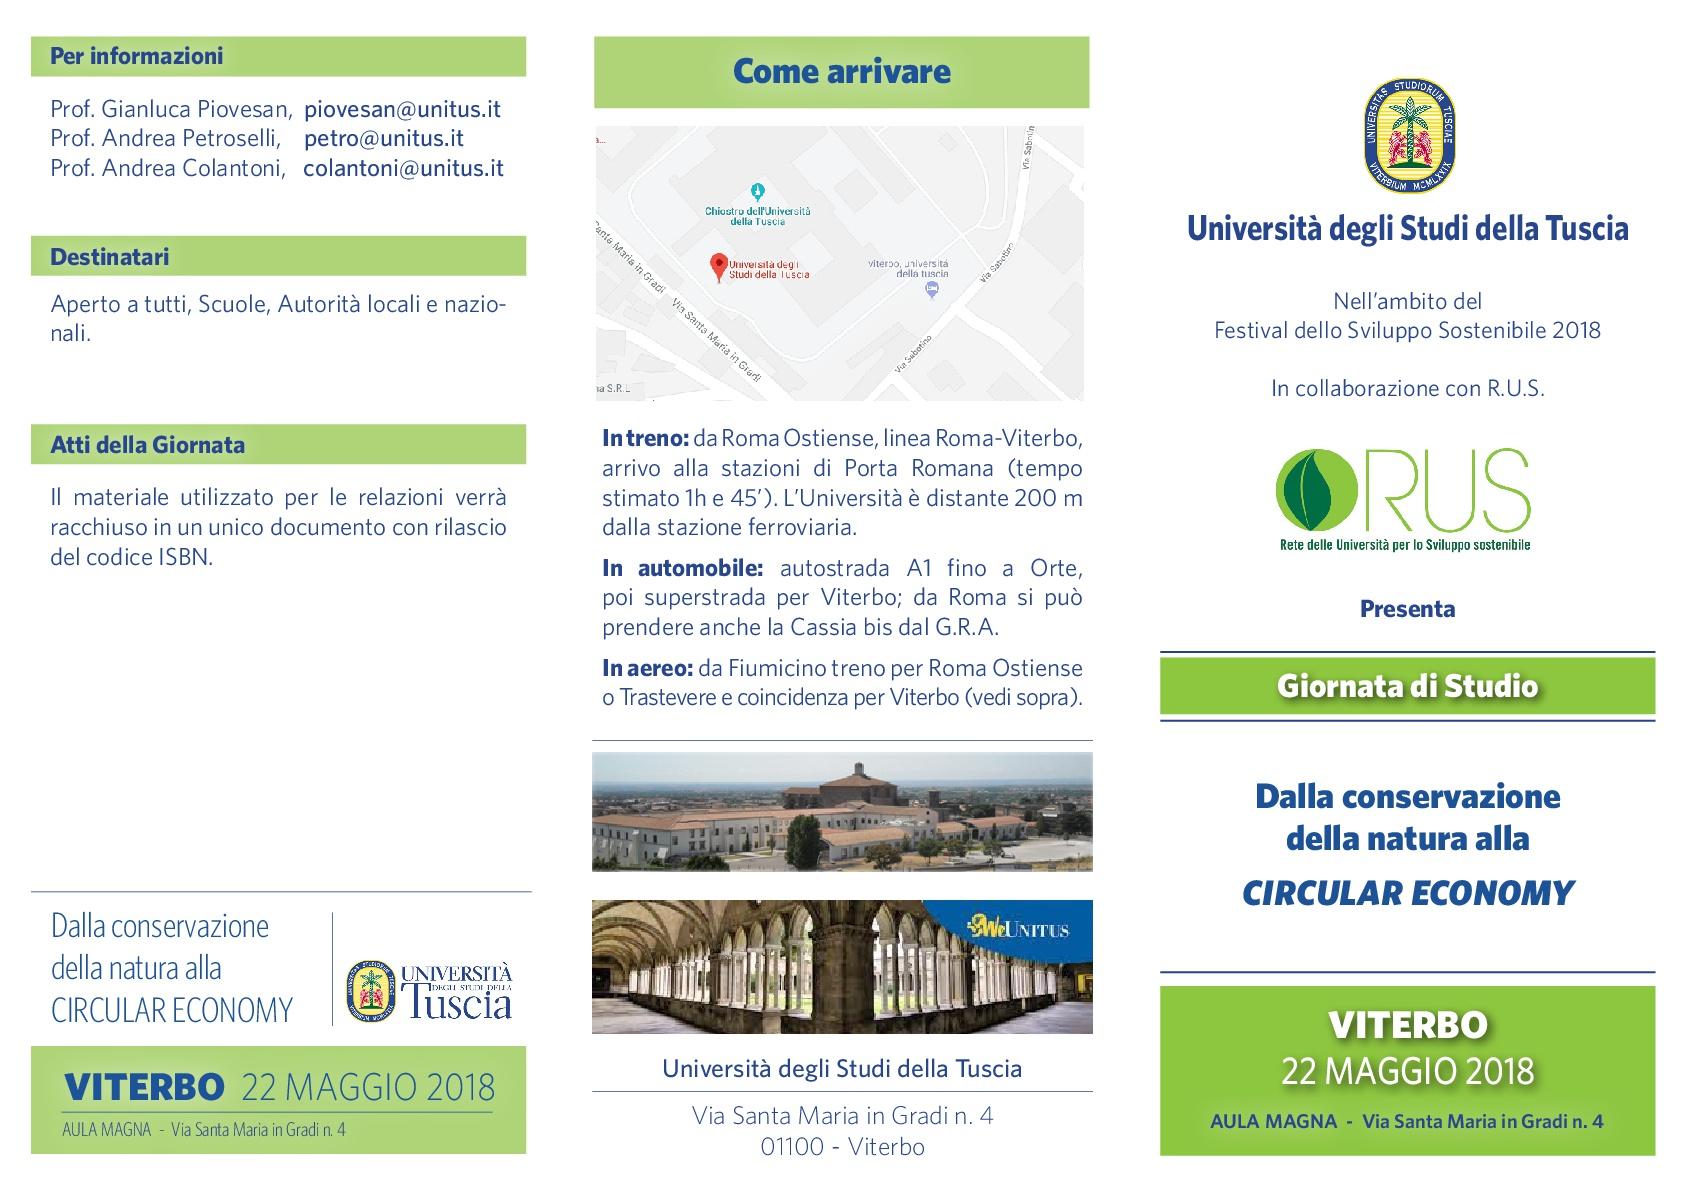 Pieghevole--CIRCULAR-ECONOMY--2018-1-001jpg